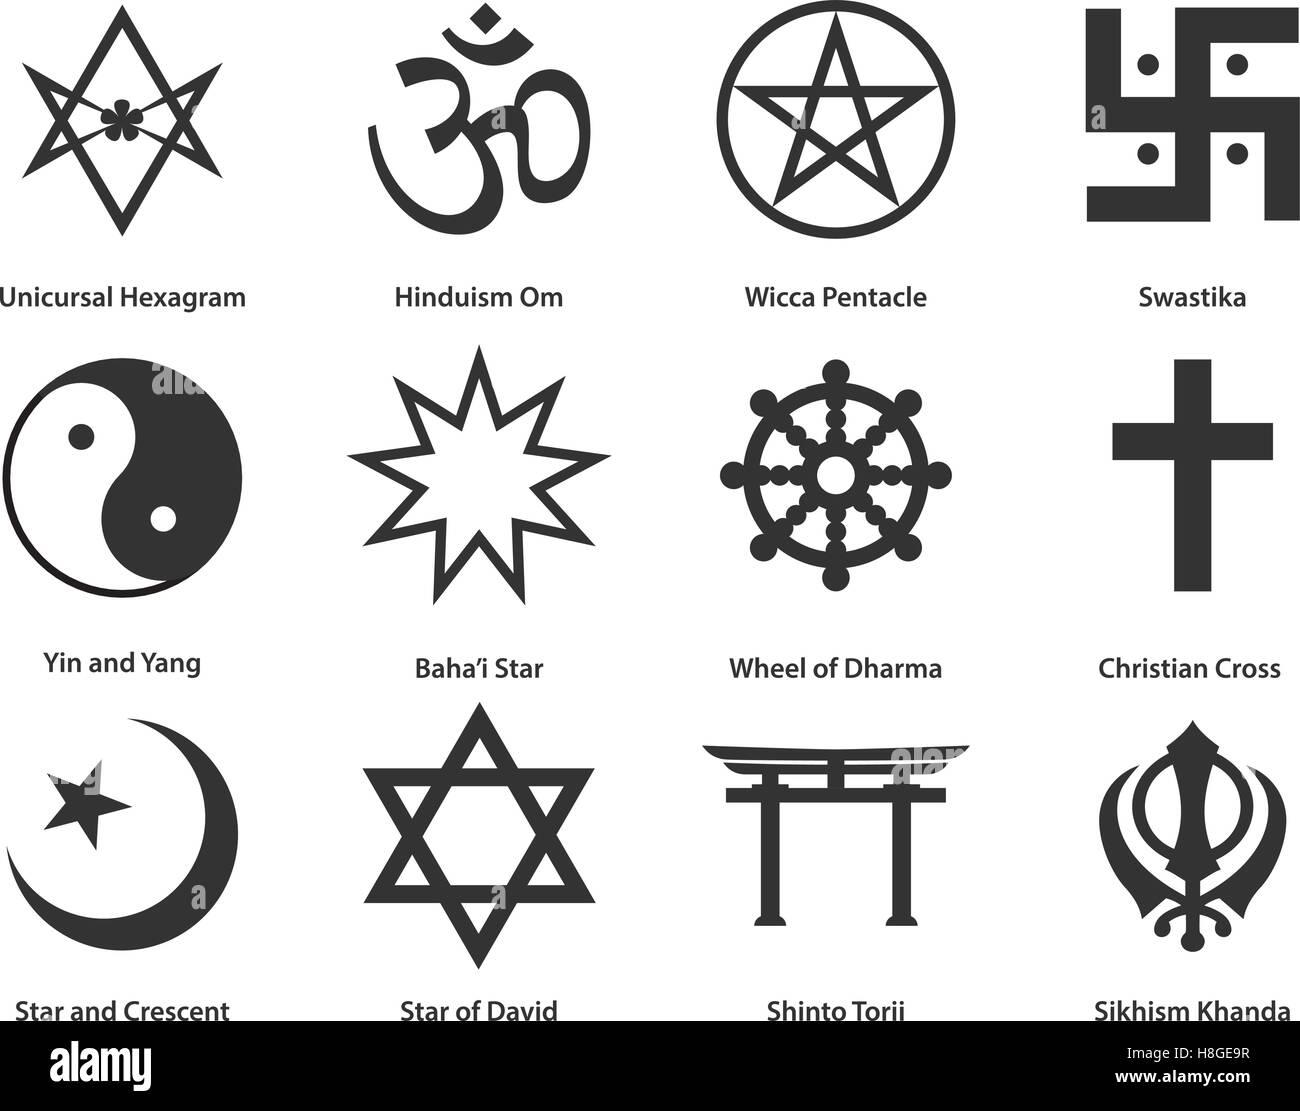 Icon Set Of World Religious Symbols Vector Illustration Stock